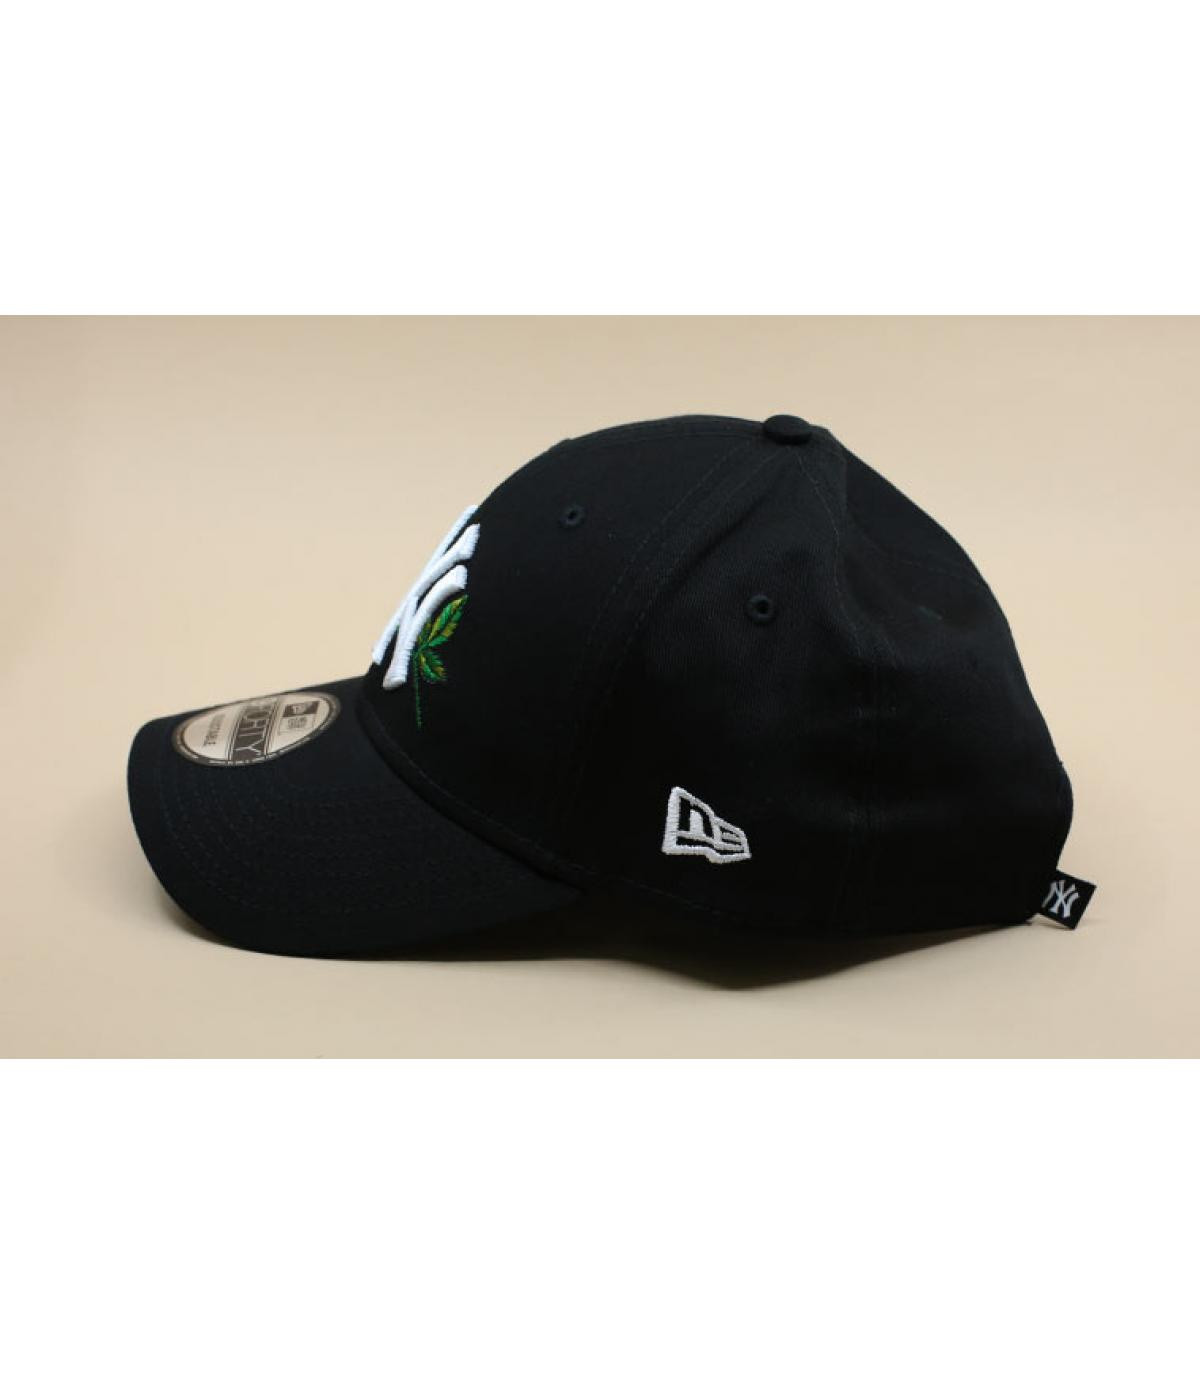 Details MLB Twine NY 940 black - afbeeling 4